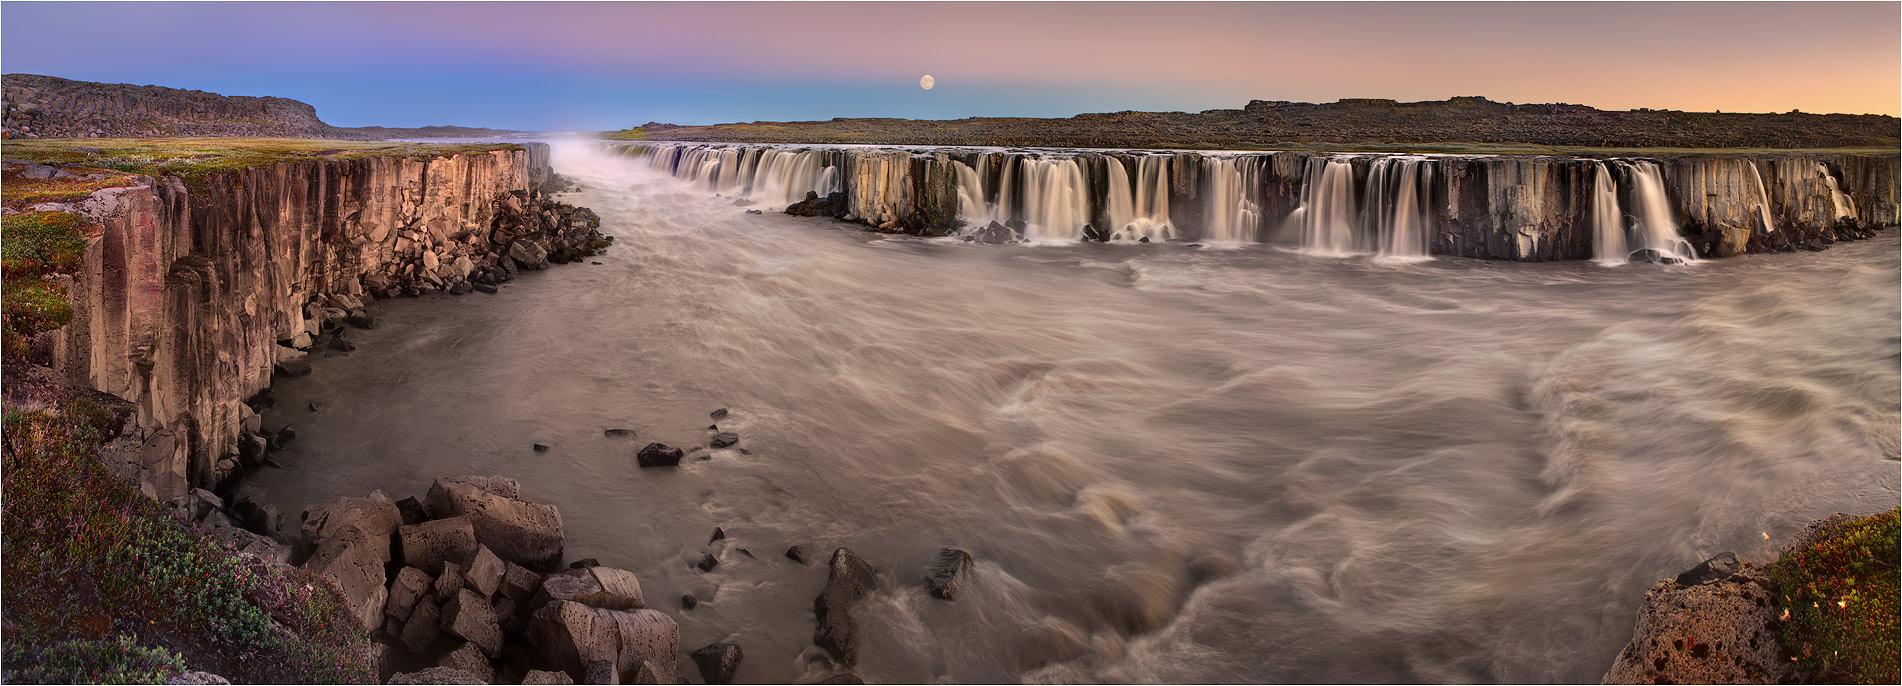 Исландия III